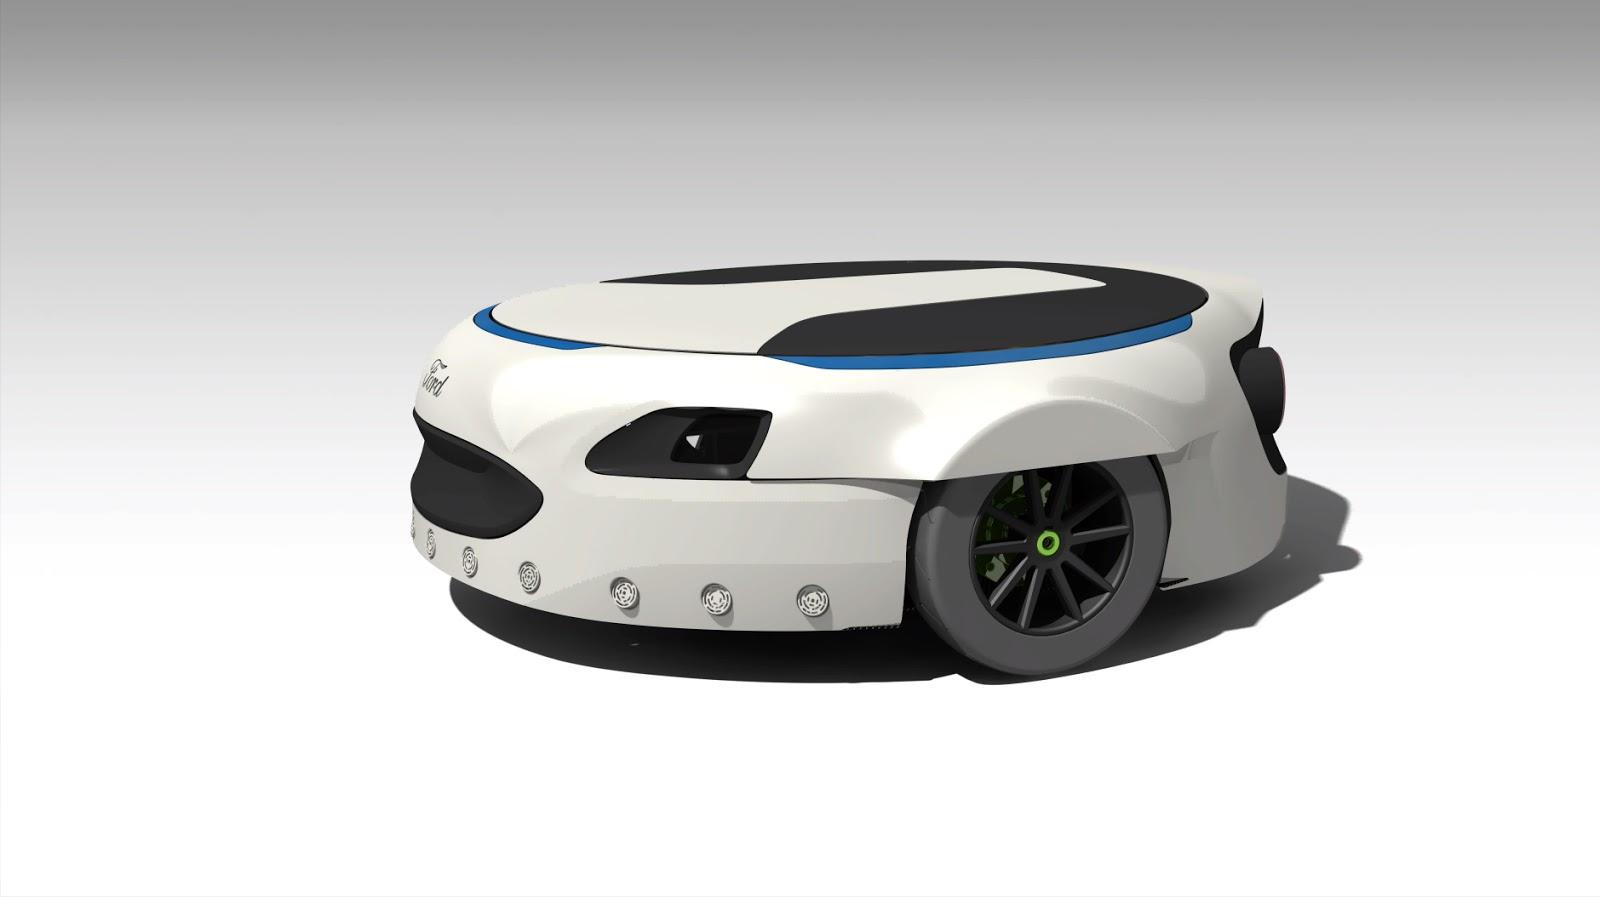 Ford IWS2016 CarrE 01 Ford : H πόλη του μέλλοντος θα έχει αυτόνομα van και drone... για delivery autolivery, Autonomous Driving, car sharing, Carr-E, Drone, Ford, Future, VAN, Αυτοκίνηση, Τεχνολογία